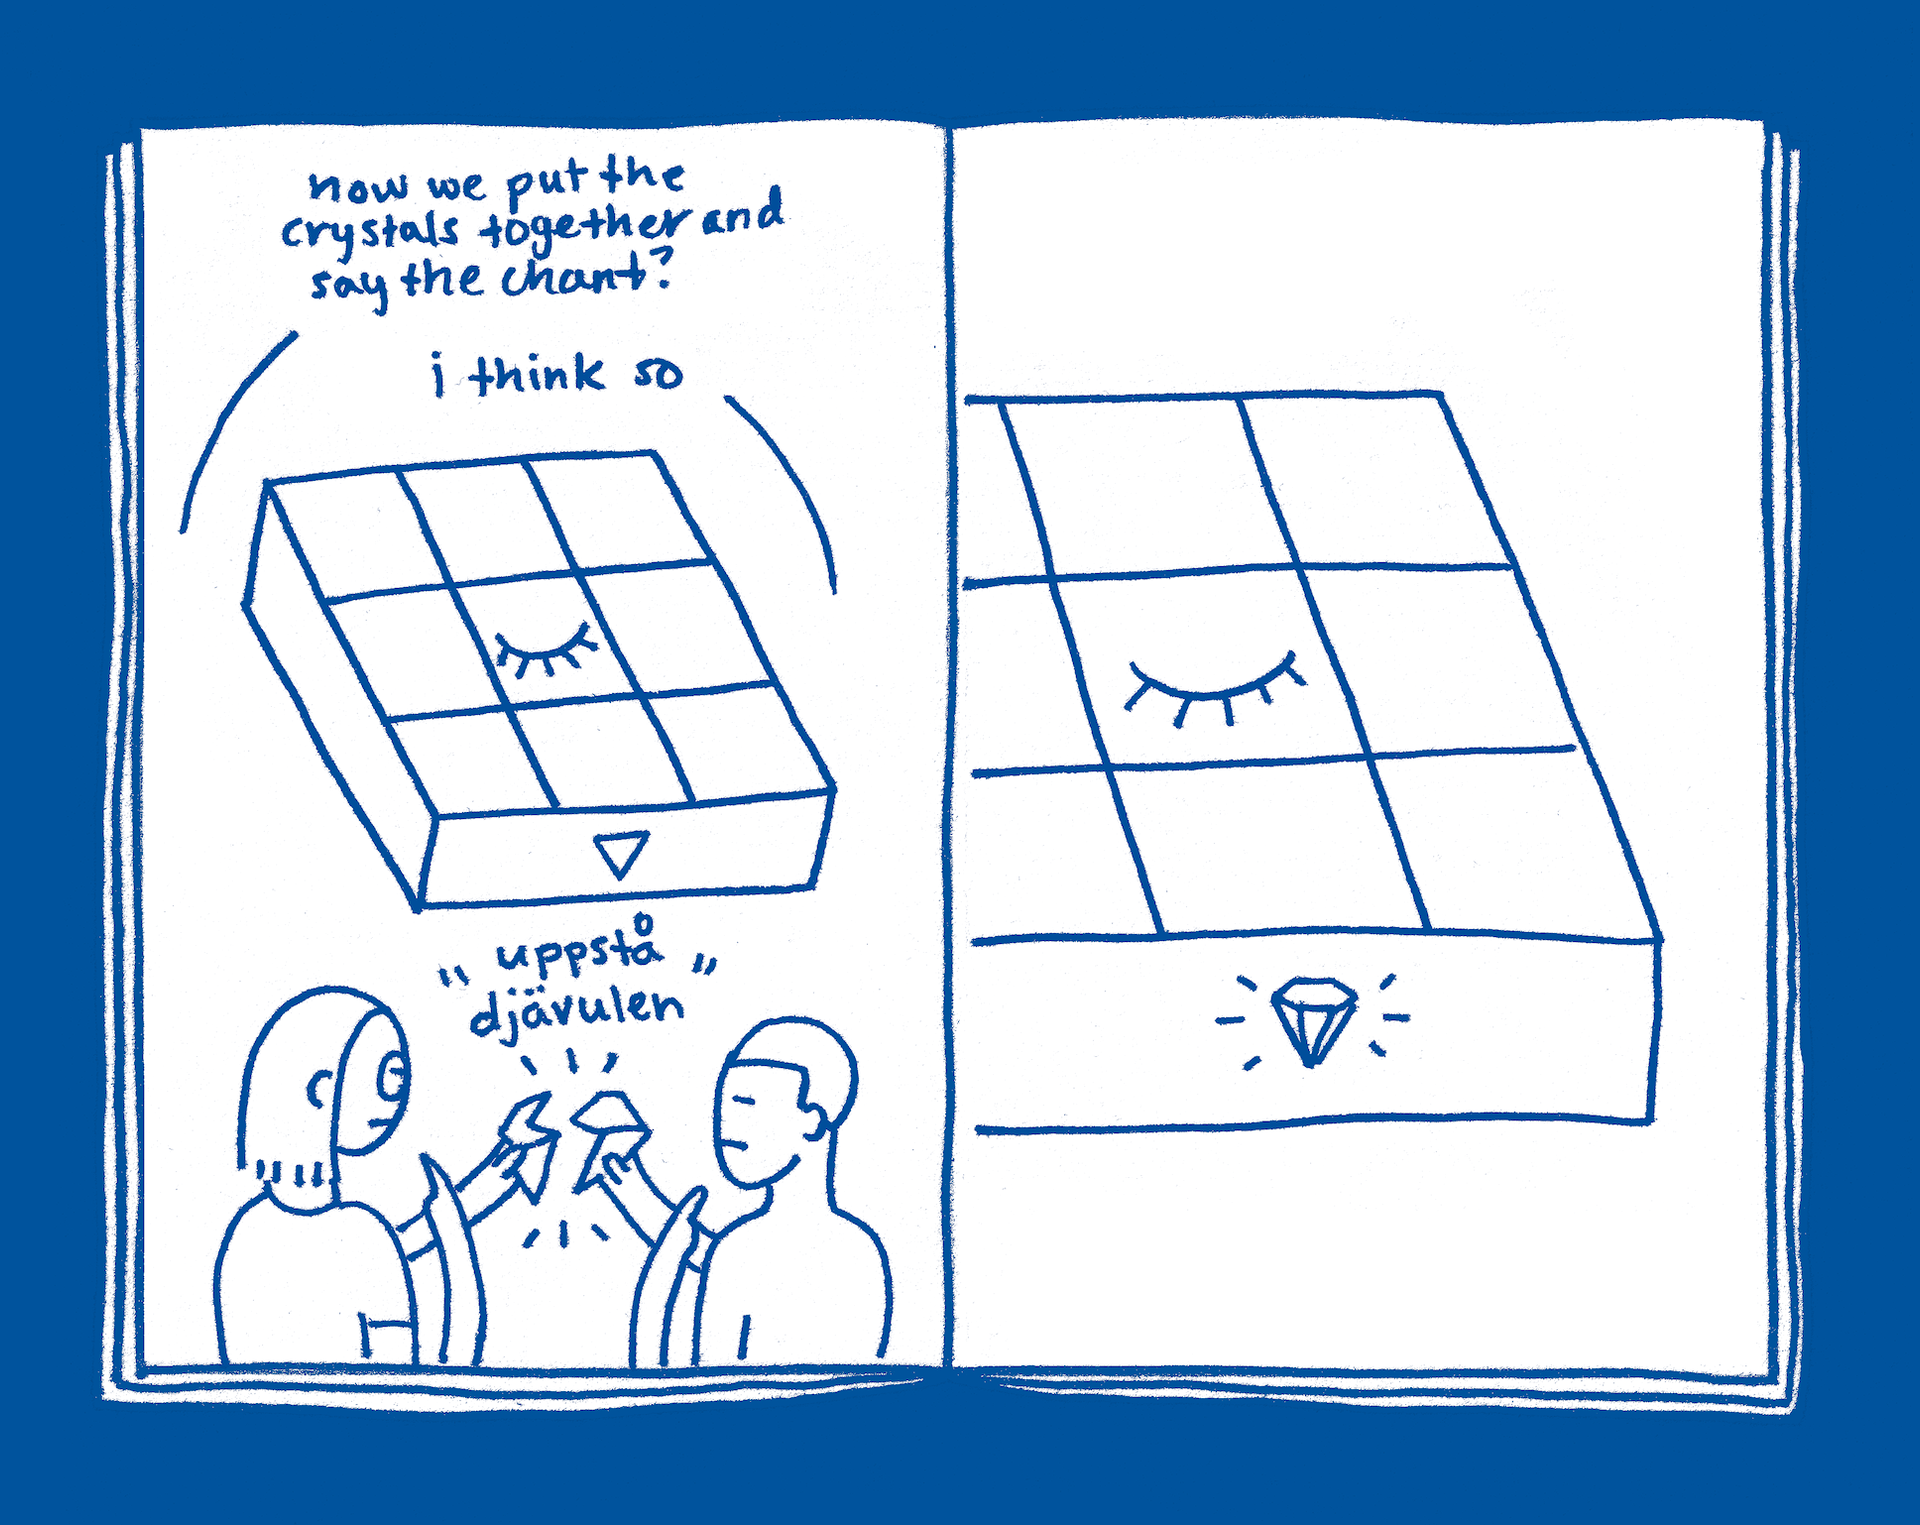 IKEA_drawnpages_600dpi_7-8.png